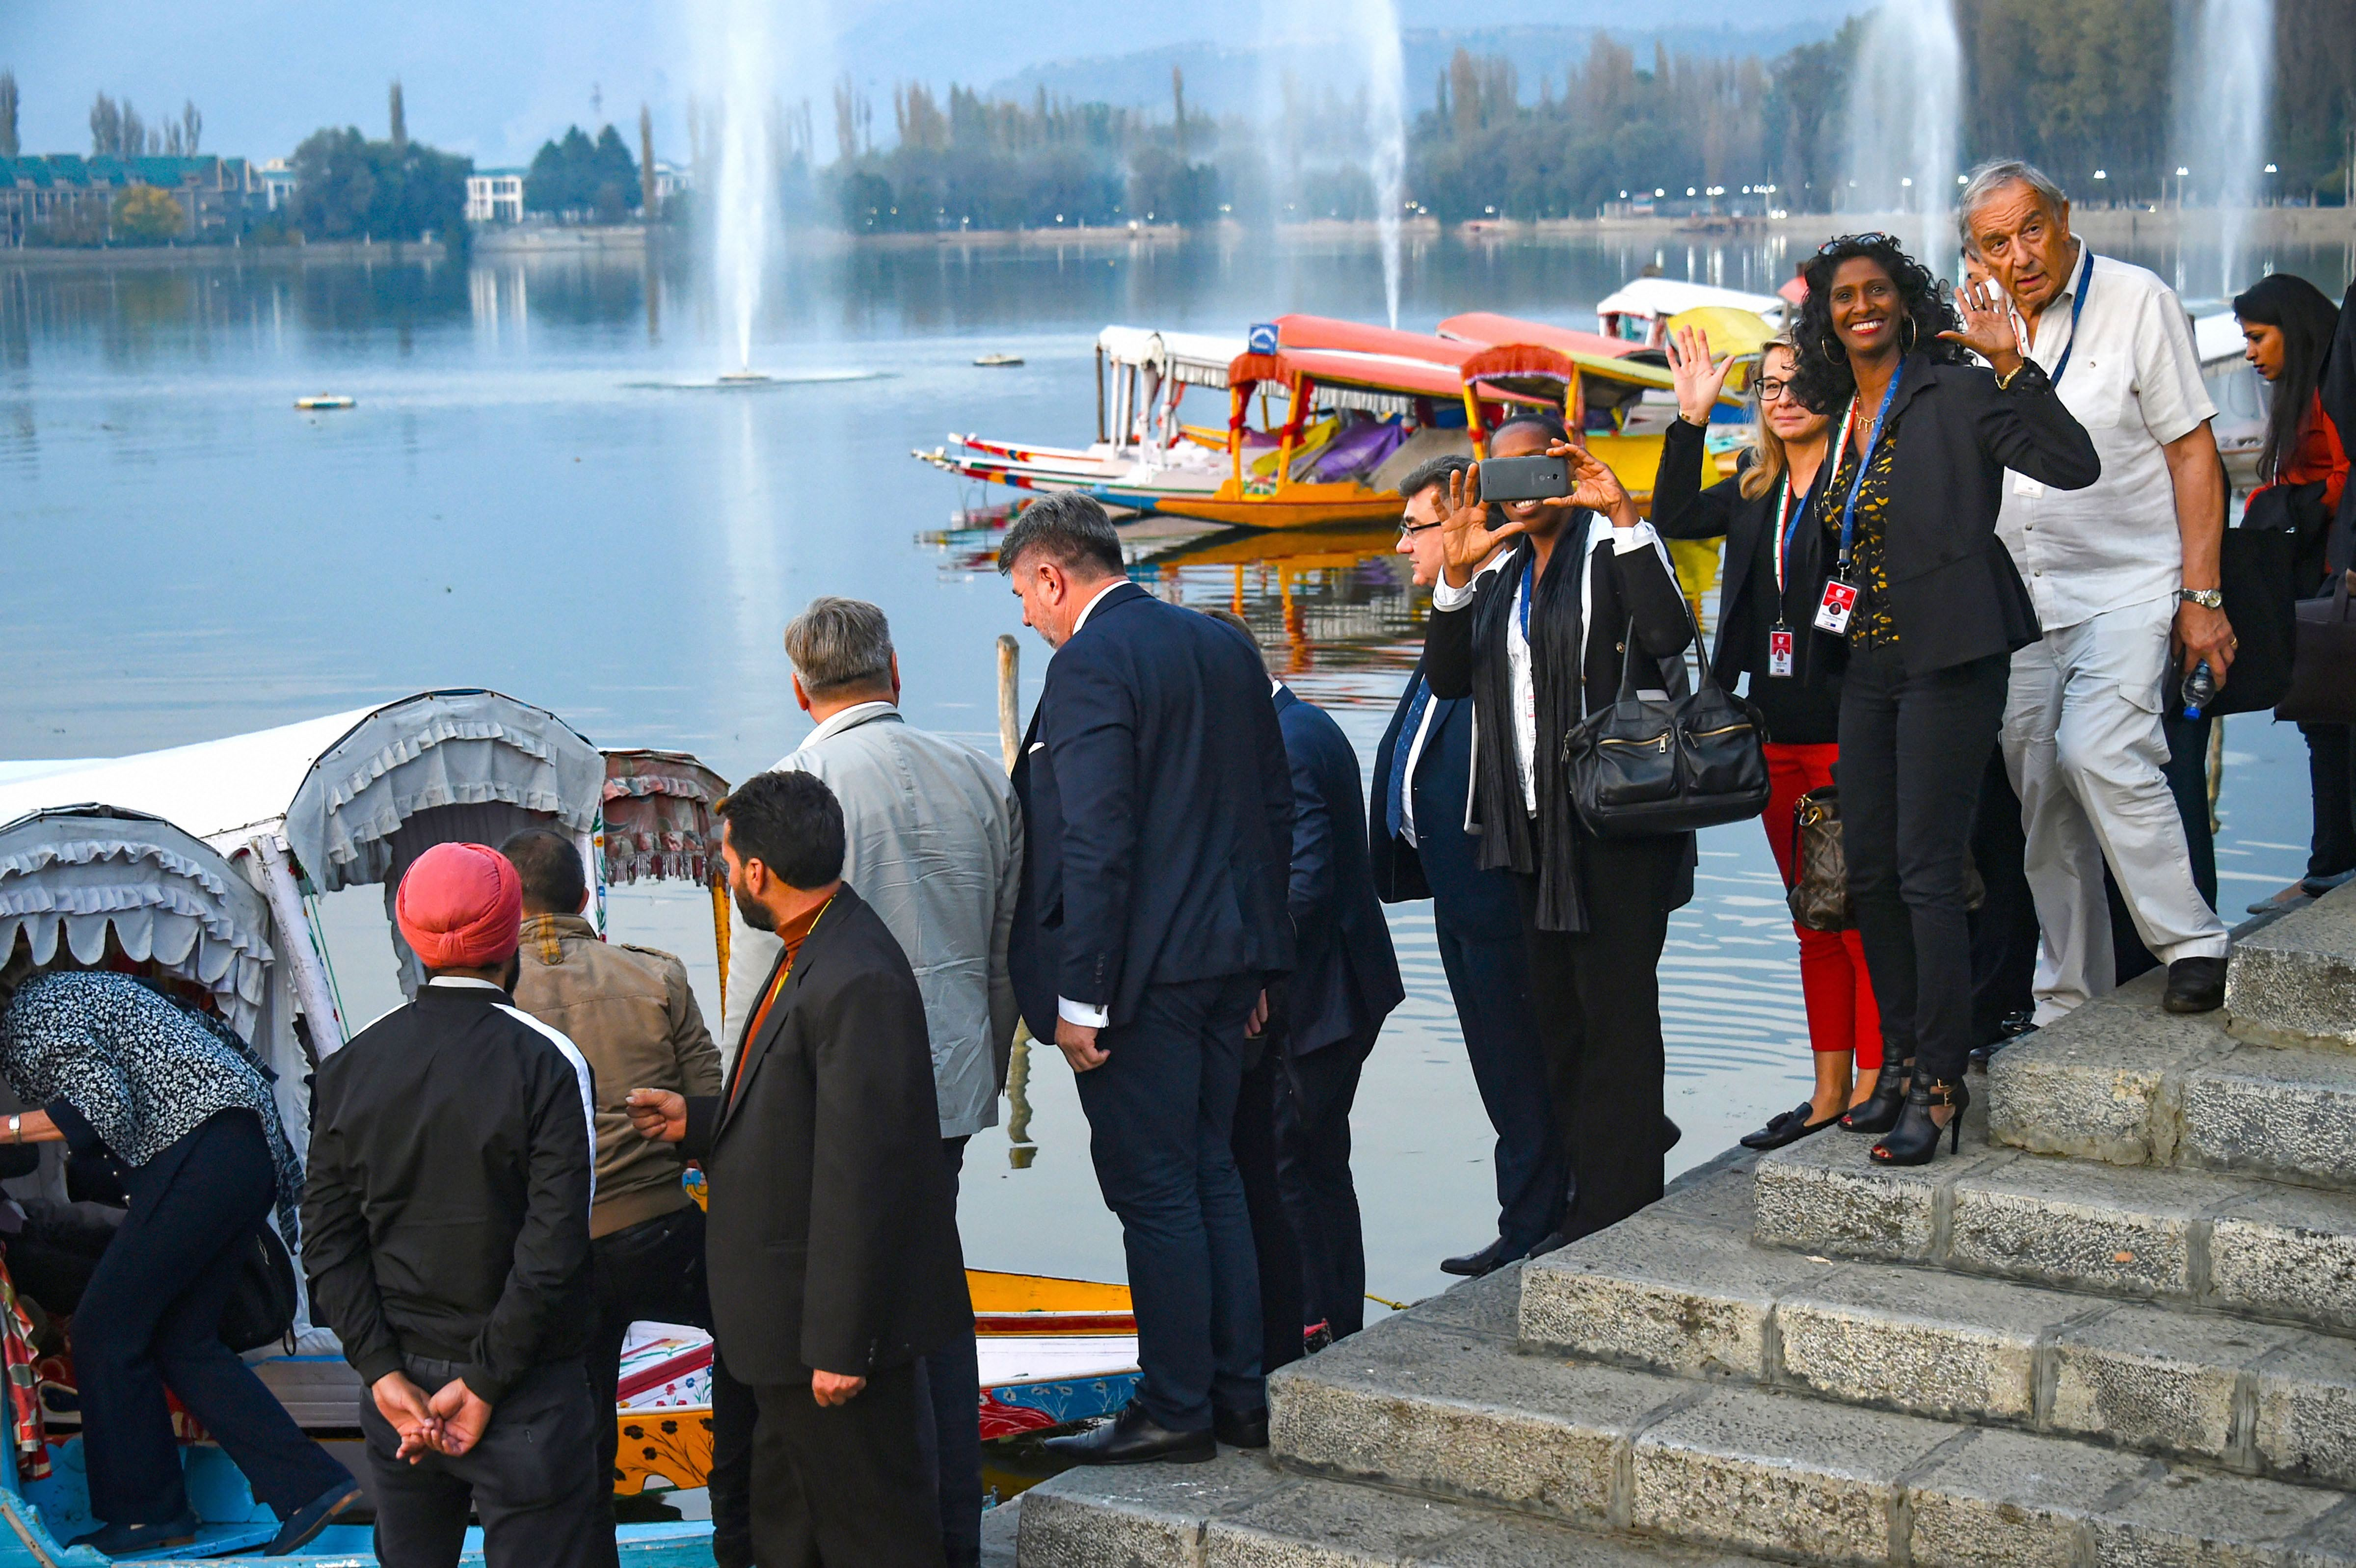 Members of European Union Parliament delegation board a shikara ride at Dal Lake in Srinagar, Tuesday, October 29, 2019.